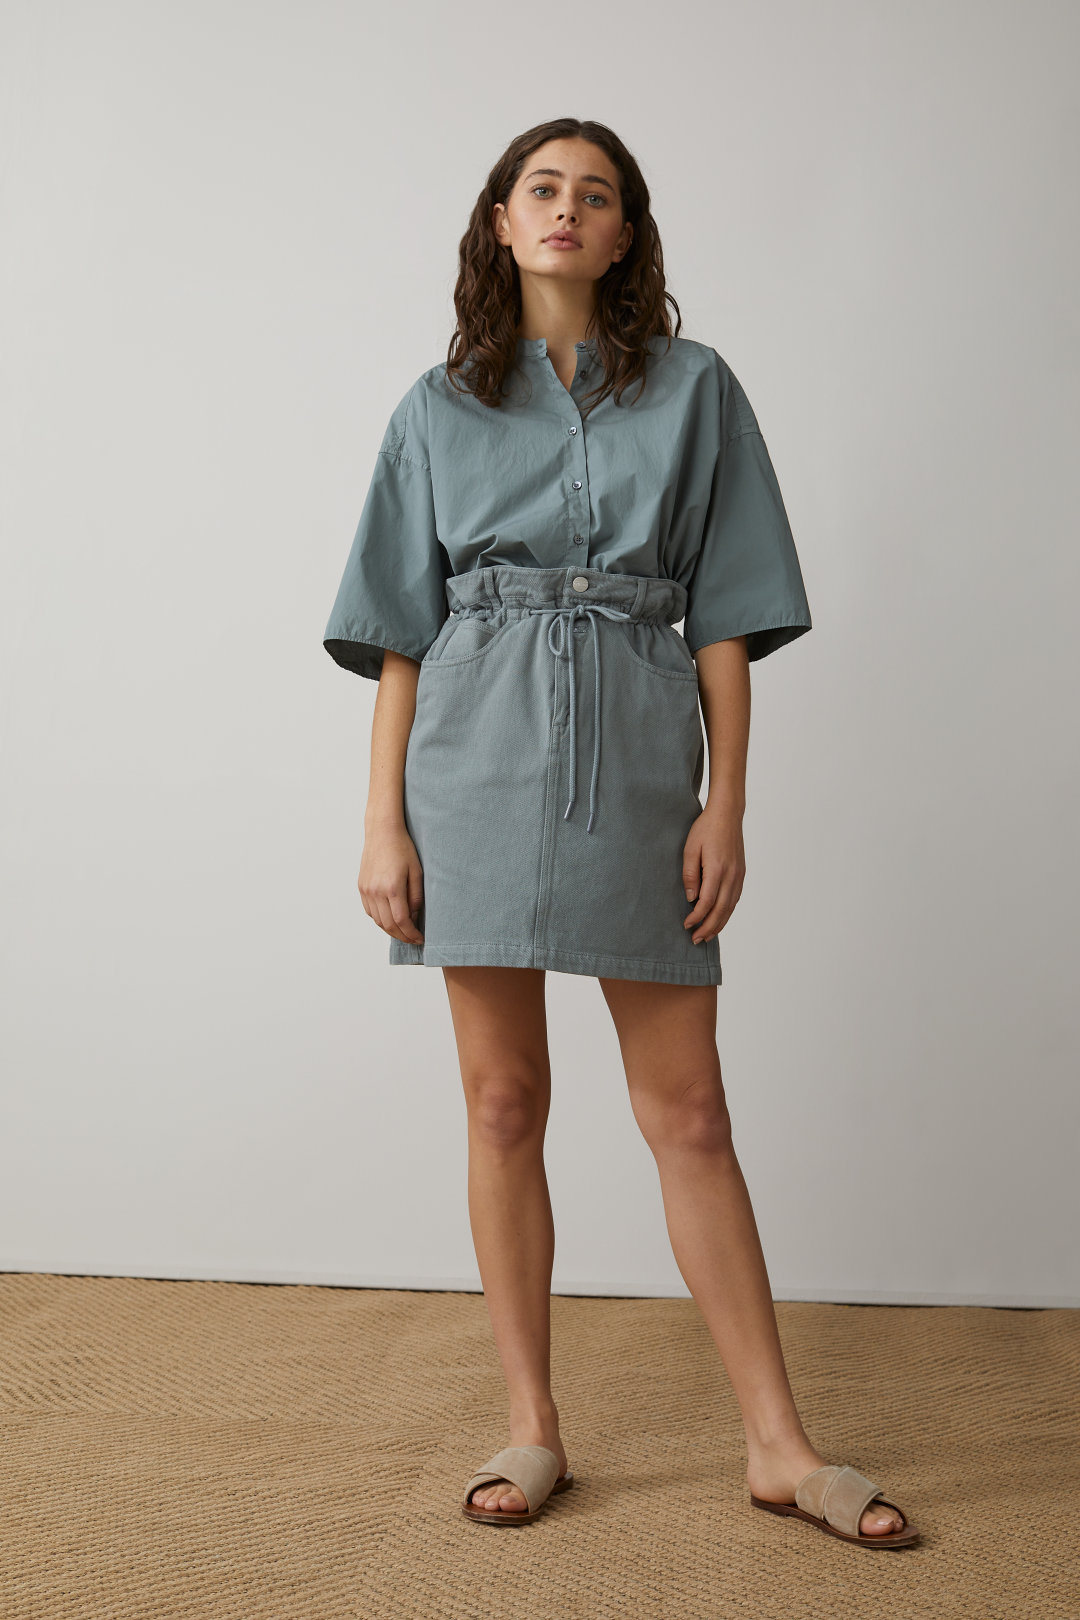 REA 30% - Cotton Twill Skirt - Closed